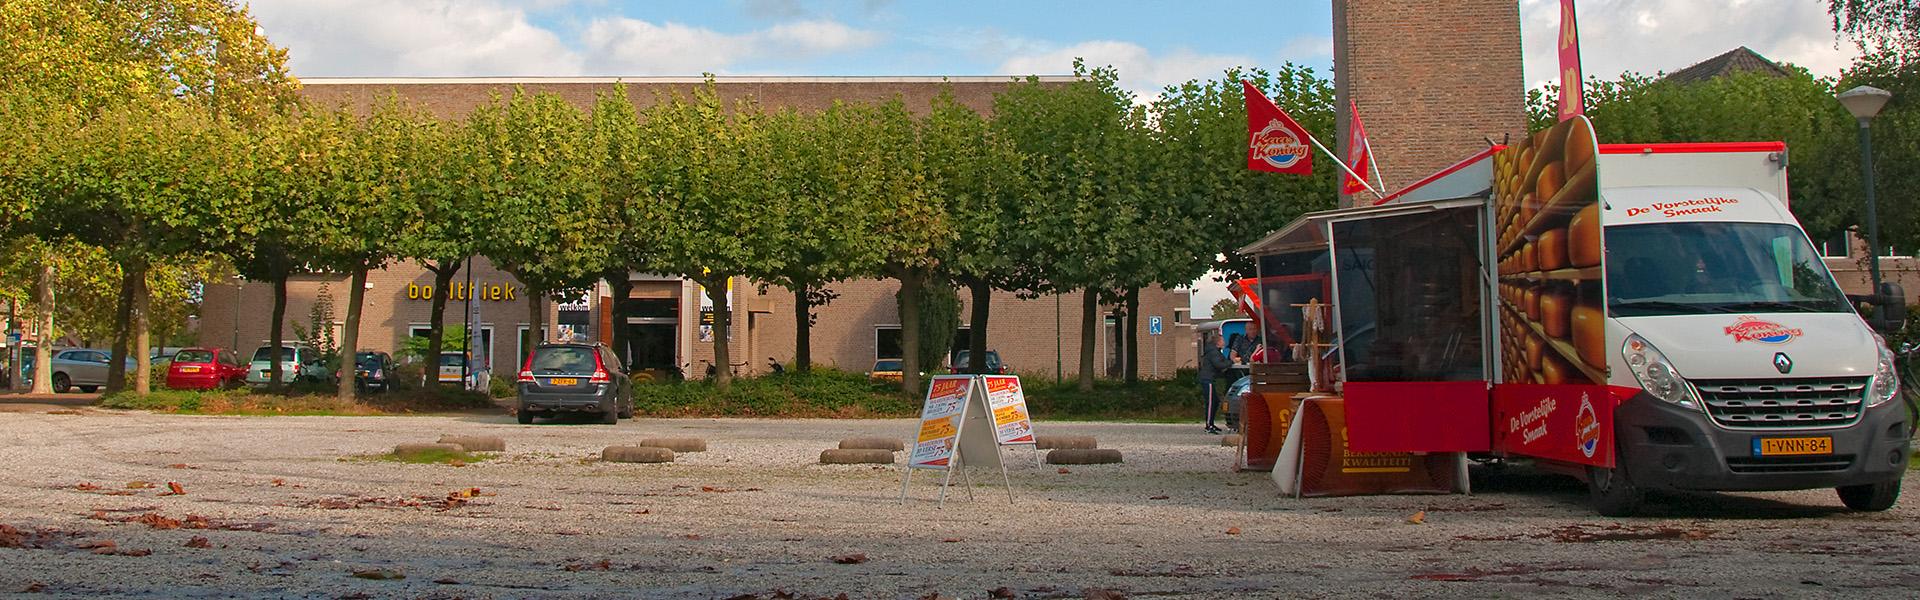 Dromenlab Gerardusplein - Parkeerplaats